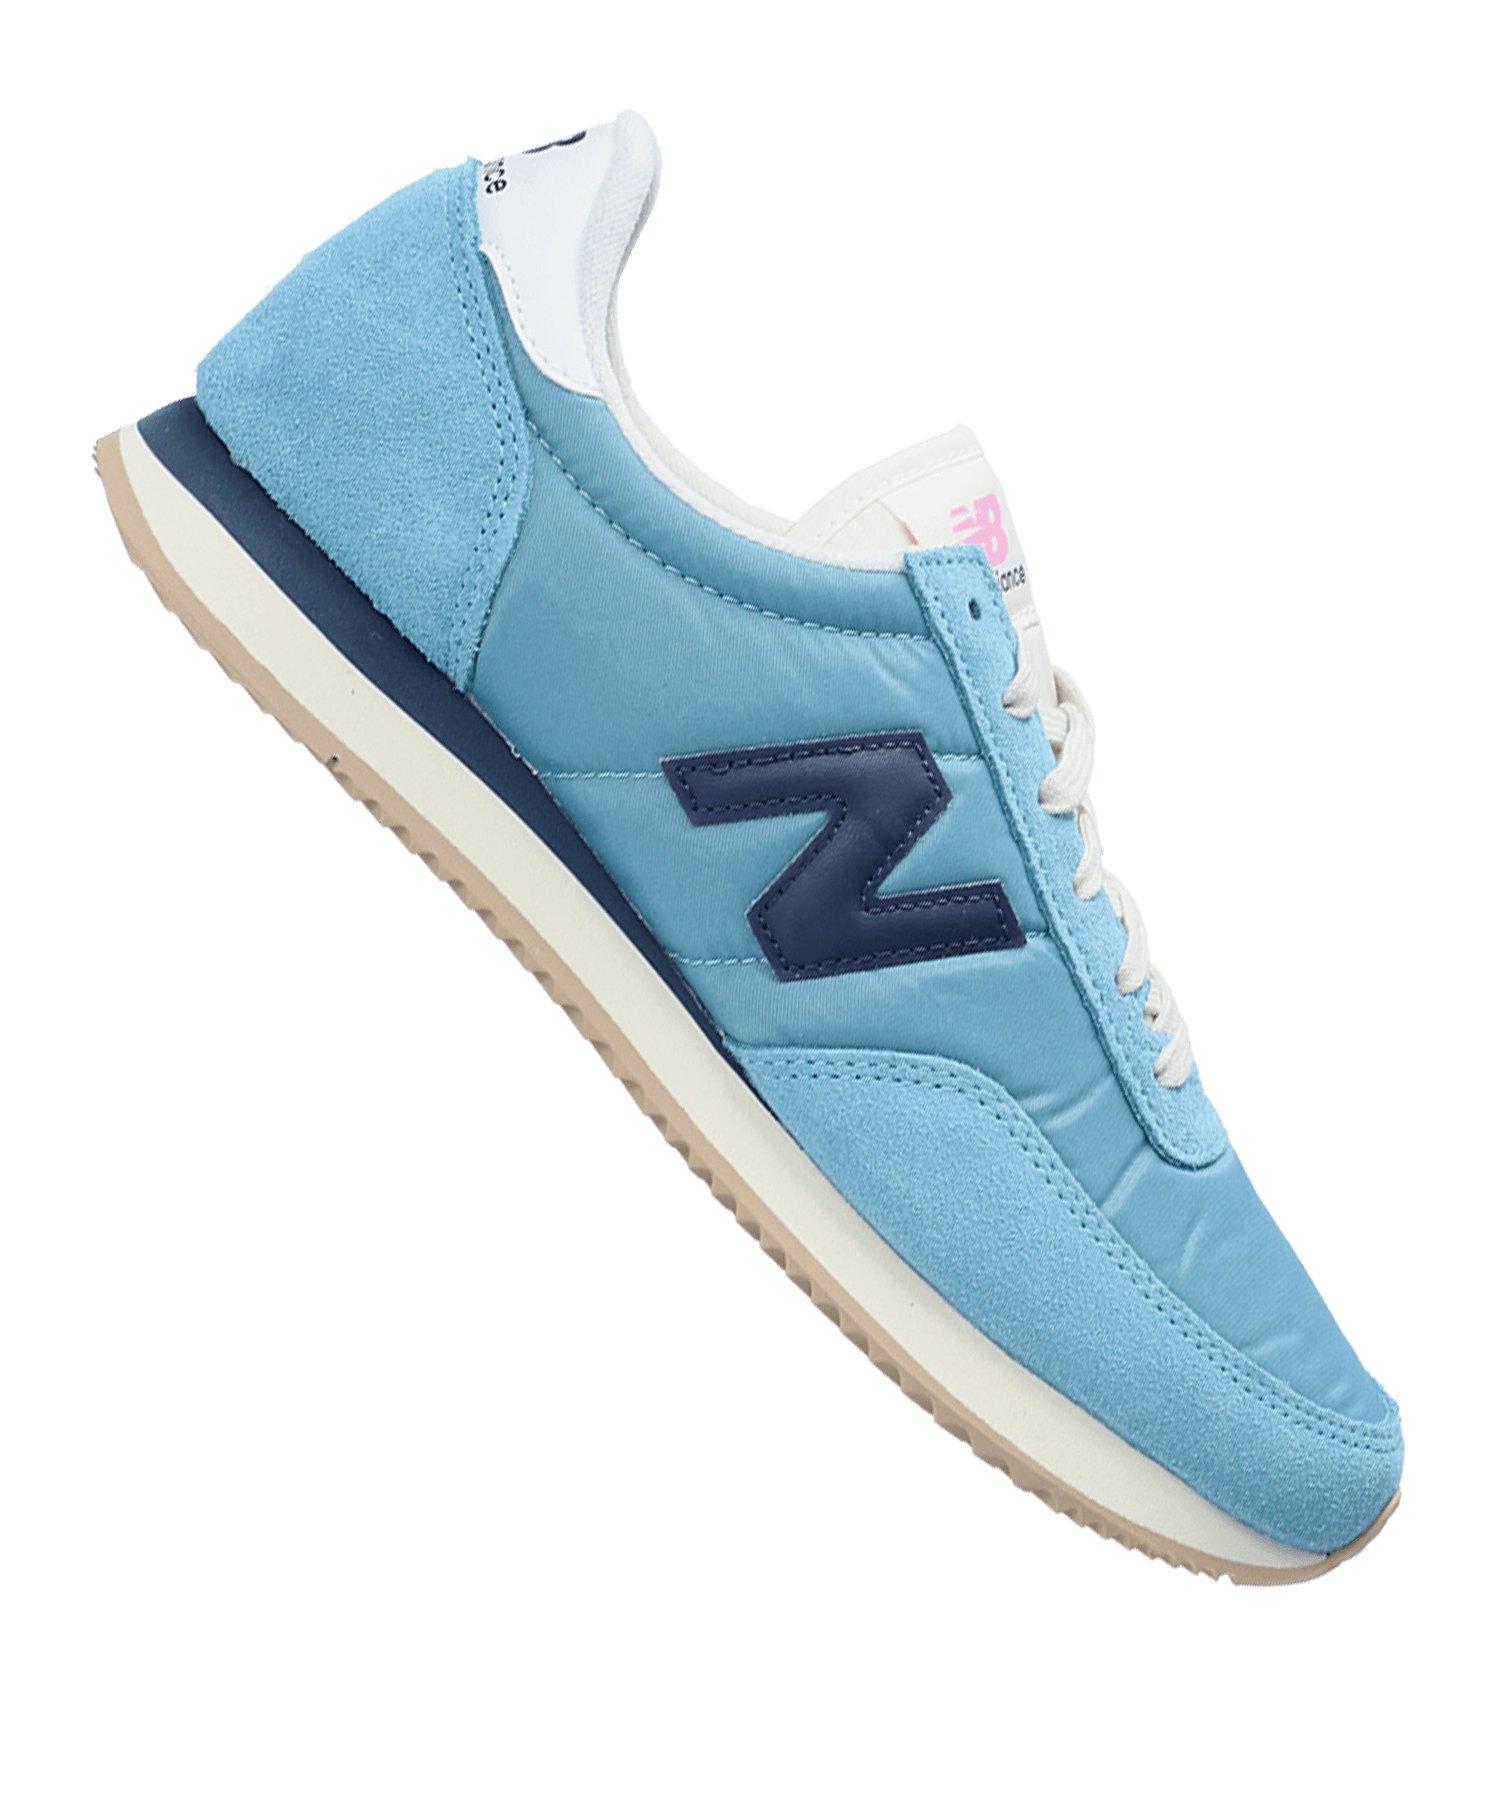 New Balance WL720 B Sneaker Damen Blau F5 - blau